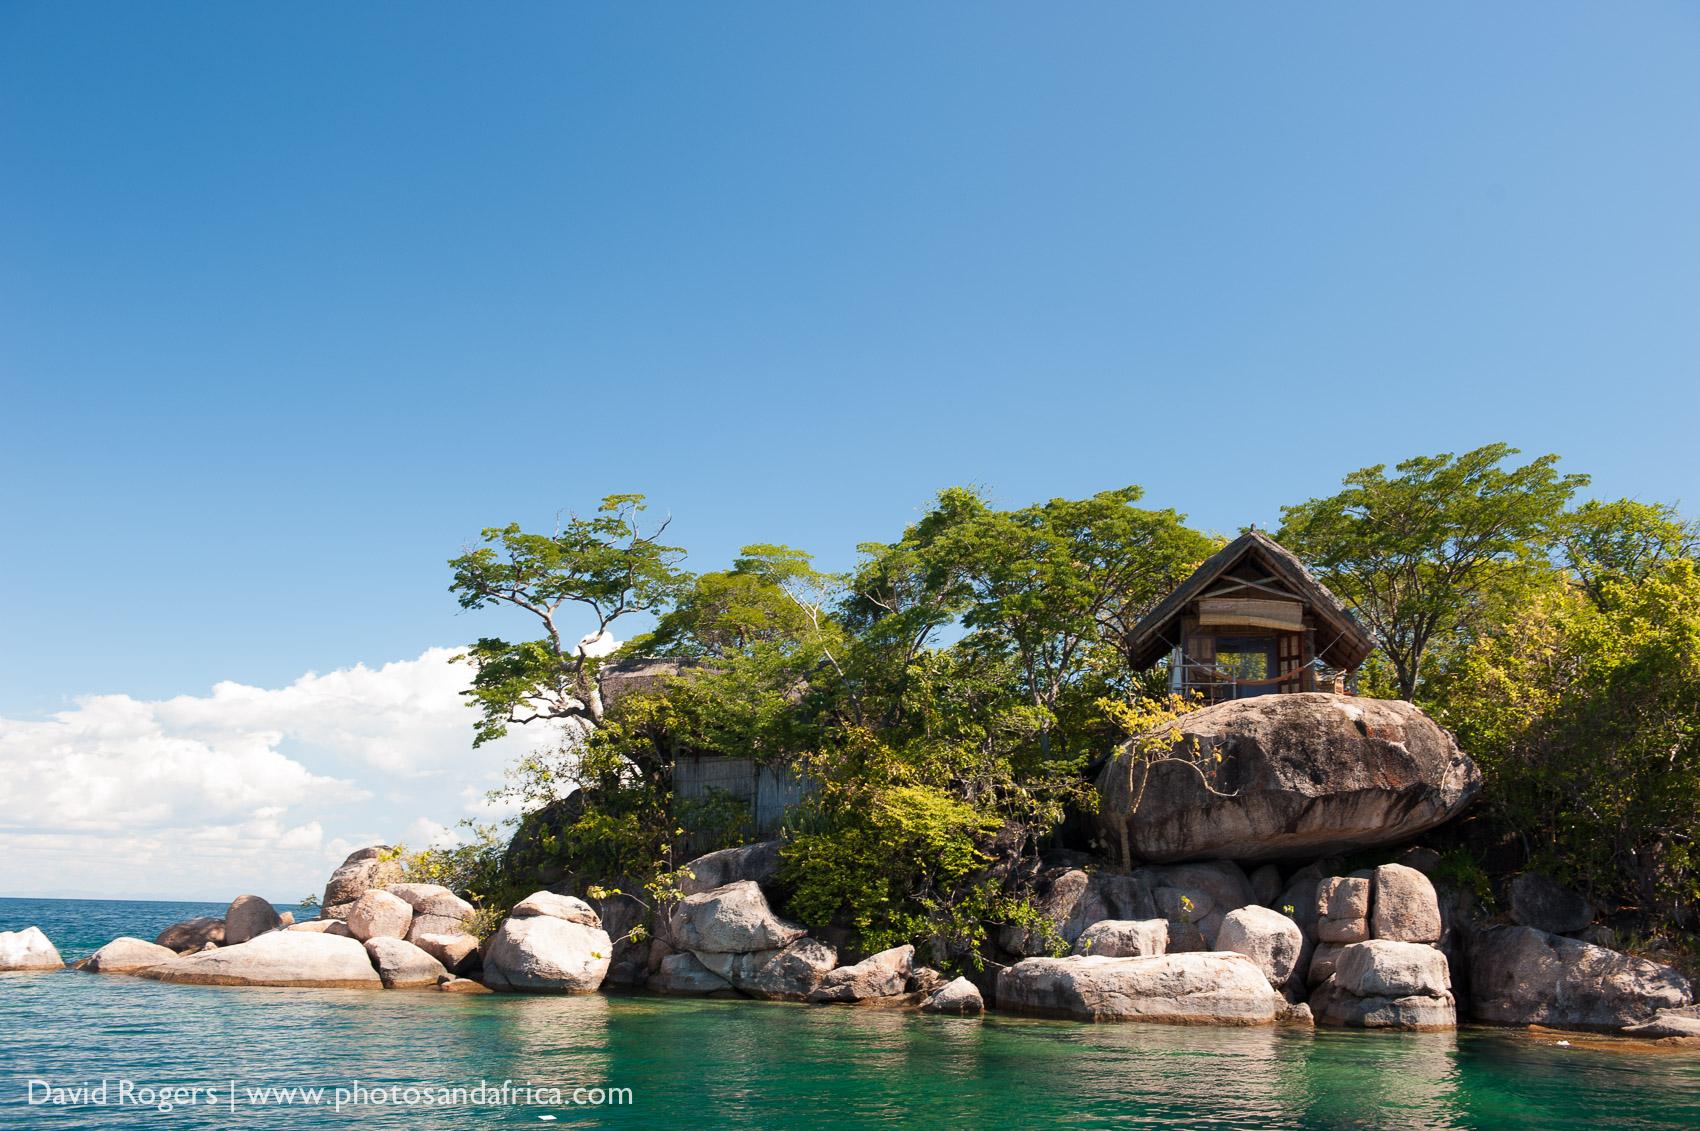 Mumbo Island, Malawai